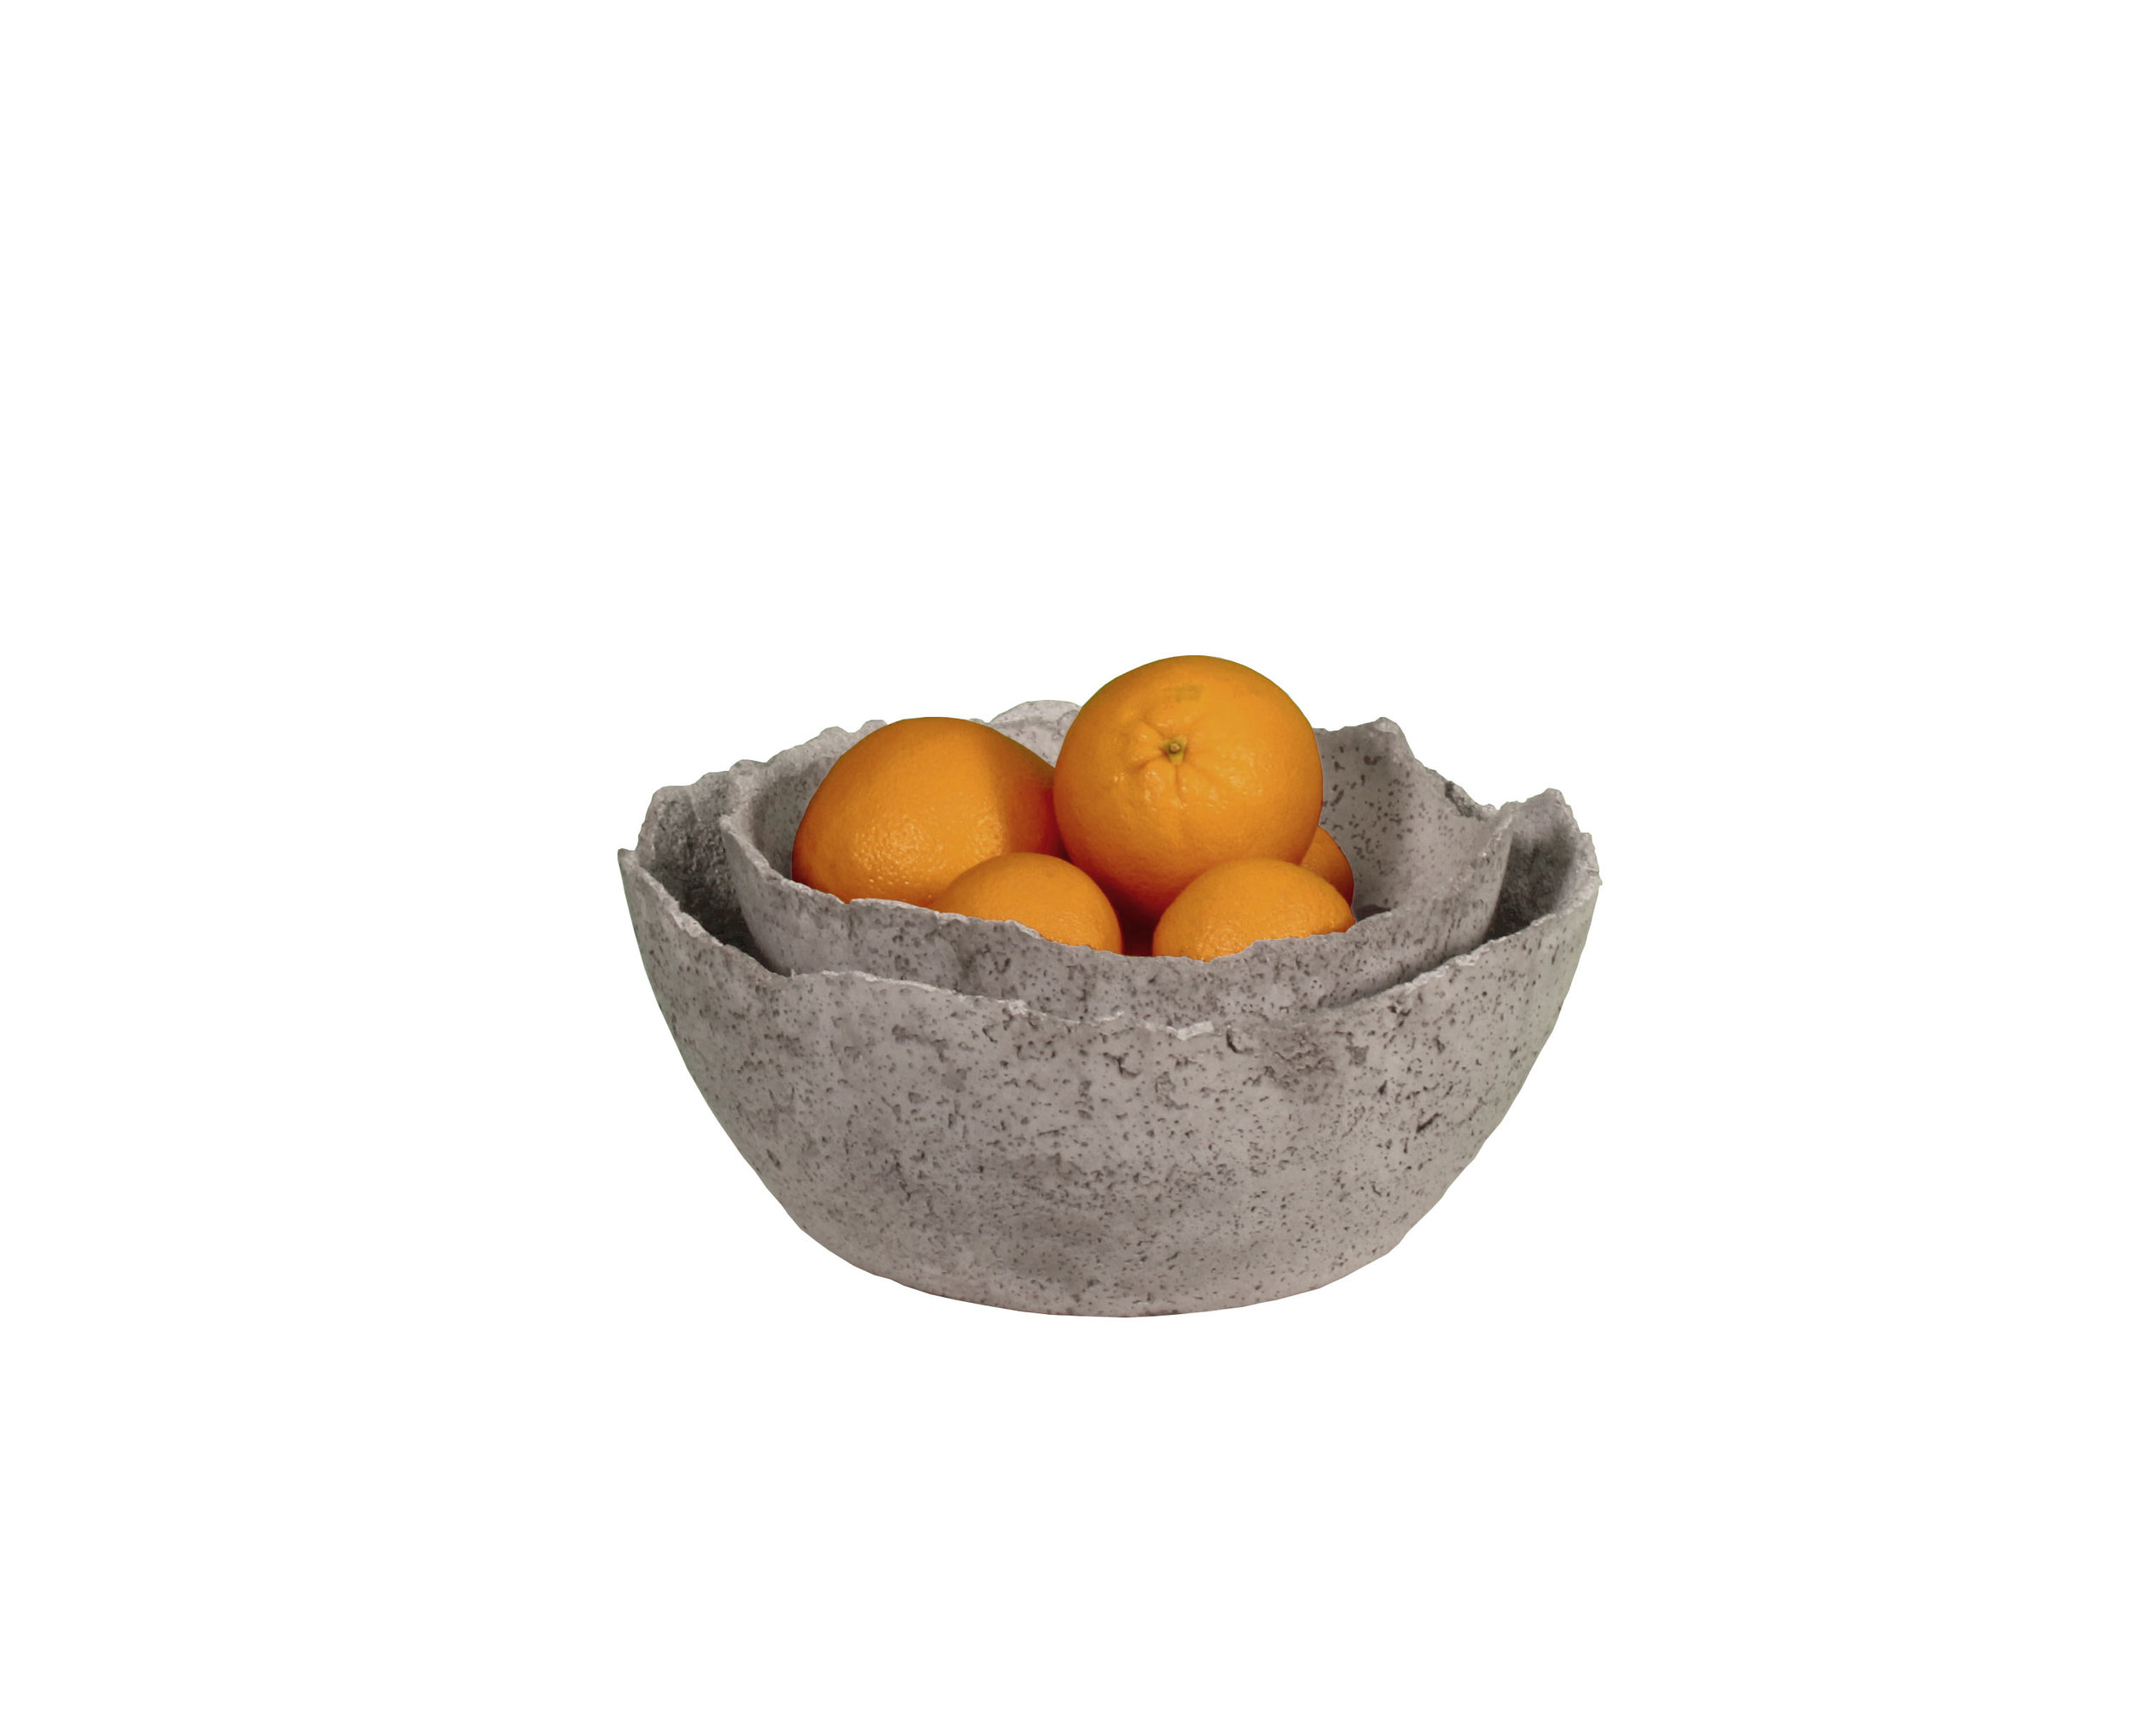 Nestled concrete bowls with oranges